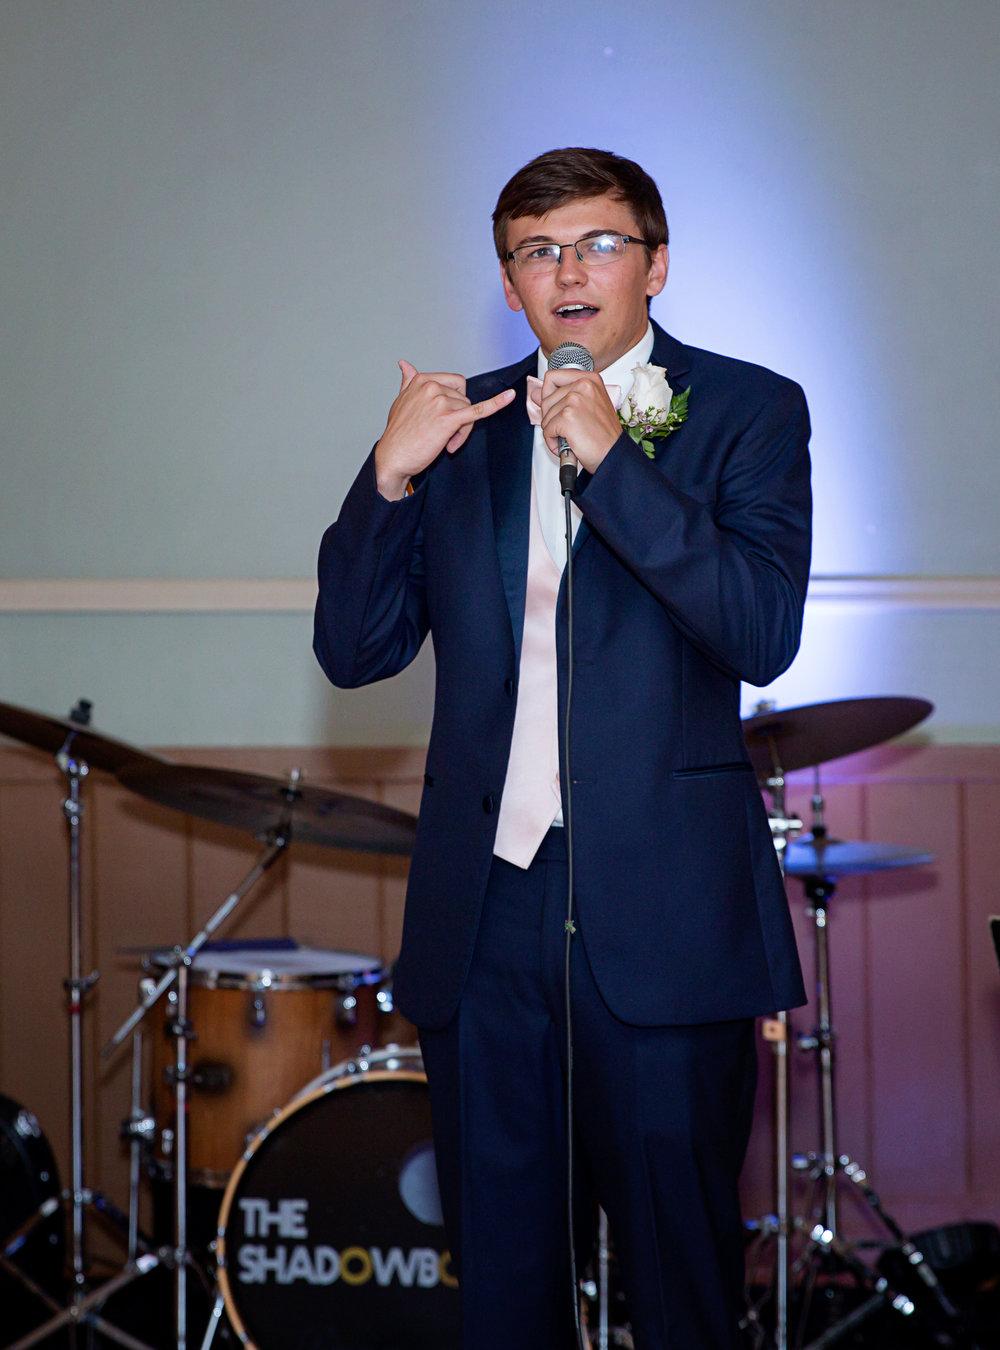 Southall Wedding 0632.jpg